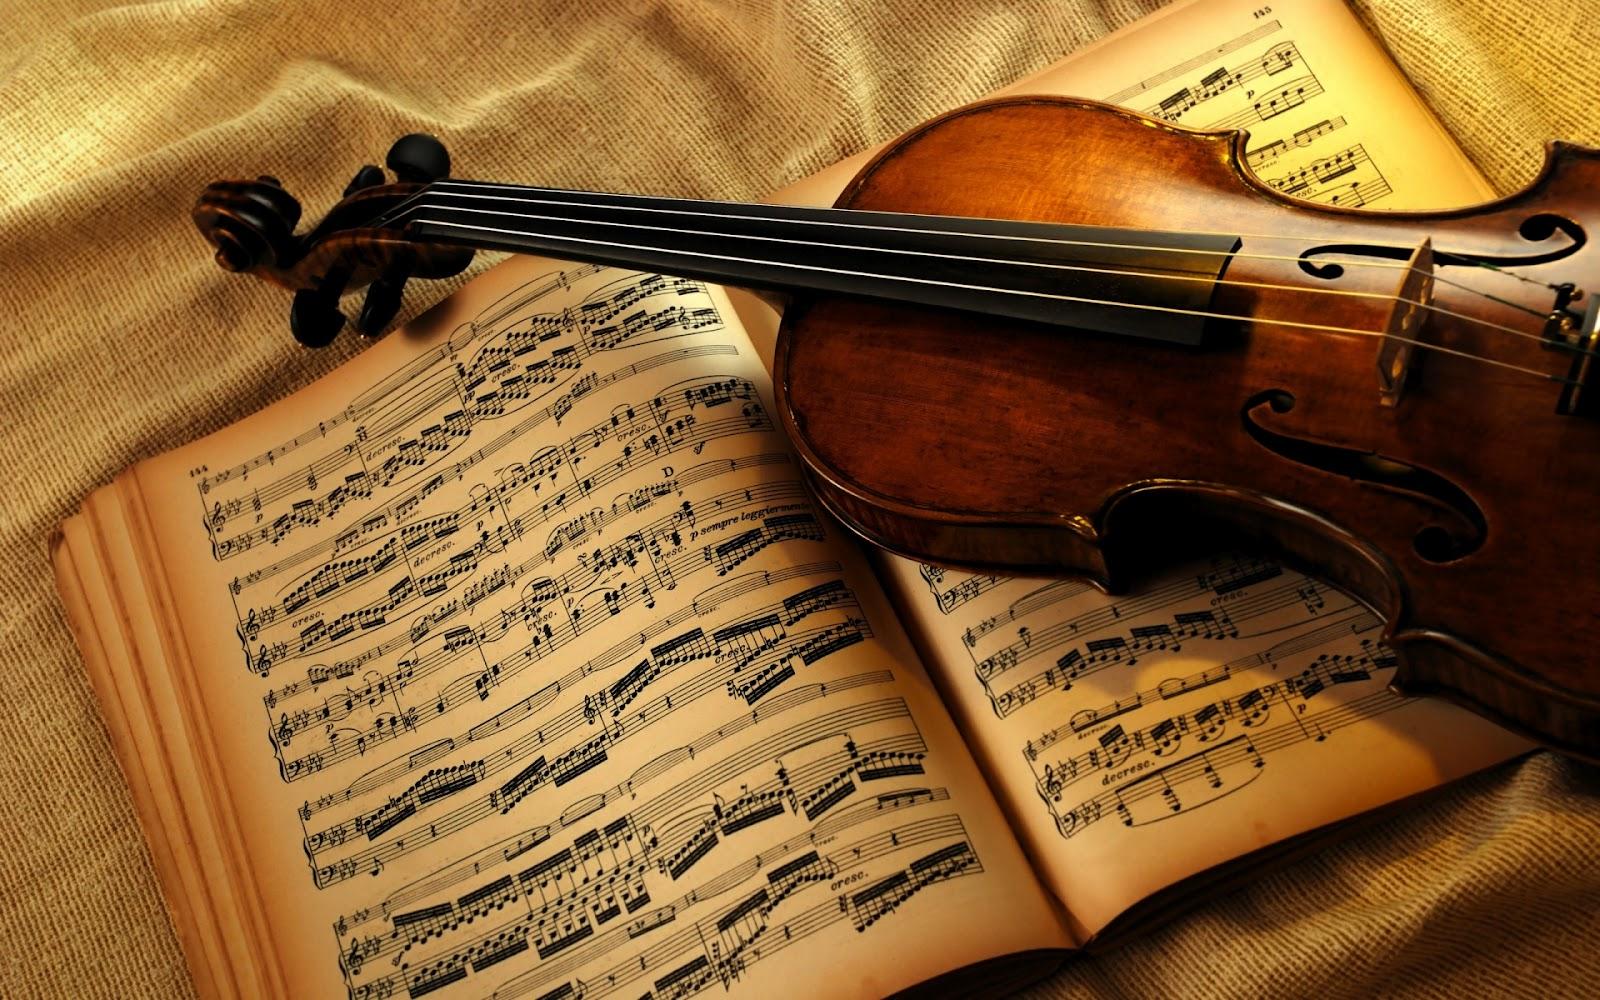 http://2.bp.blogspot.com/-1zzyLf7wZ6Q/T0zQZPJEP5I/AAAAAAAAEJo/5Dh6d-eEJog/s1600/Violin+Vintage+HD+Wallpaper.jpg